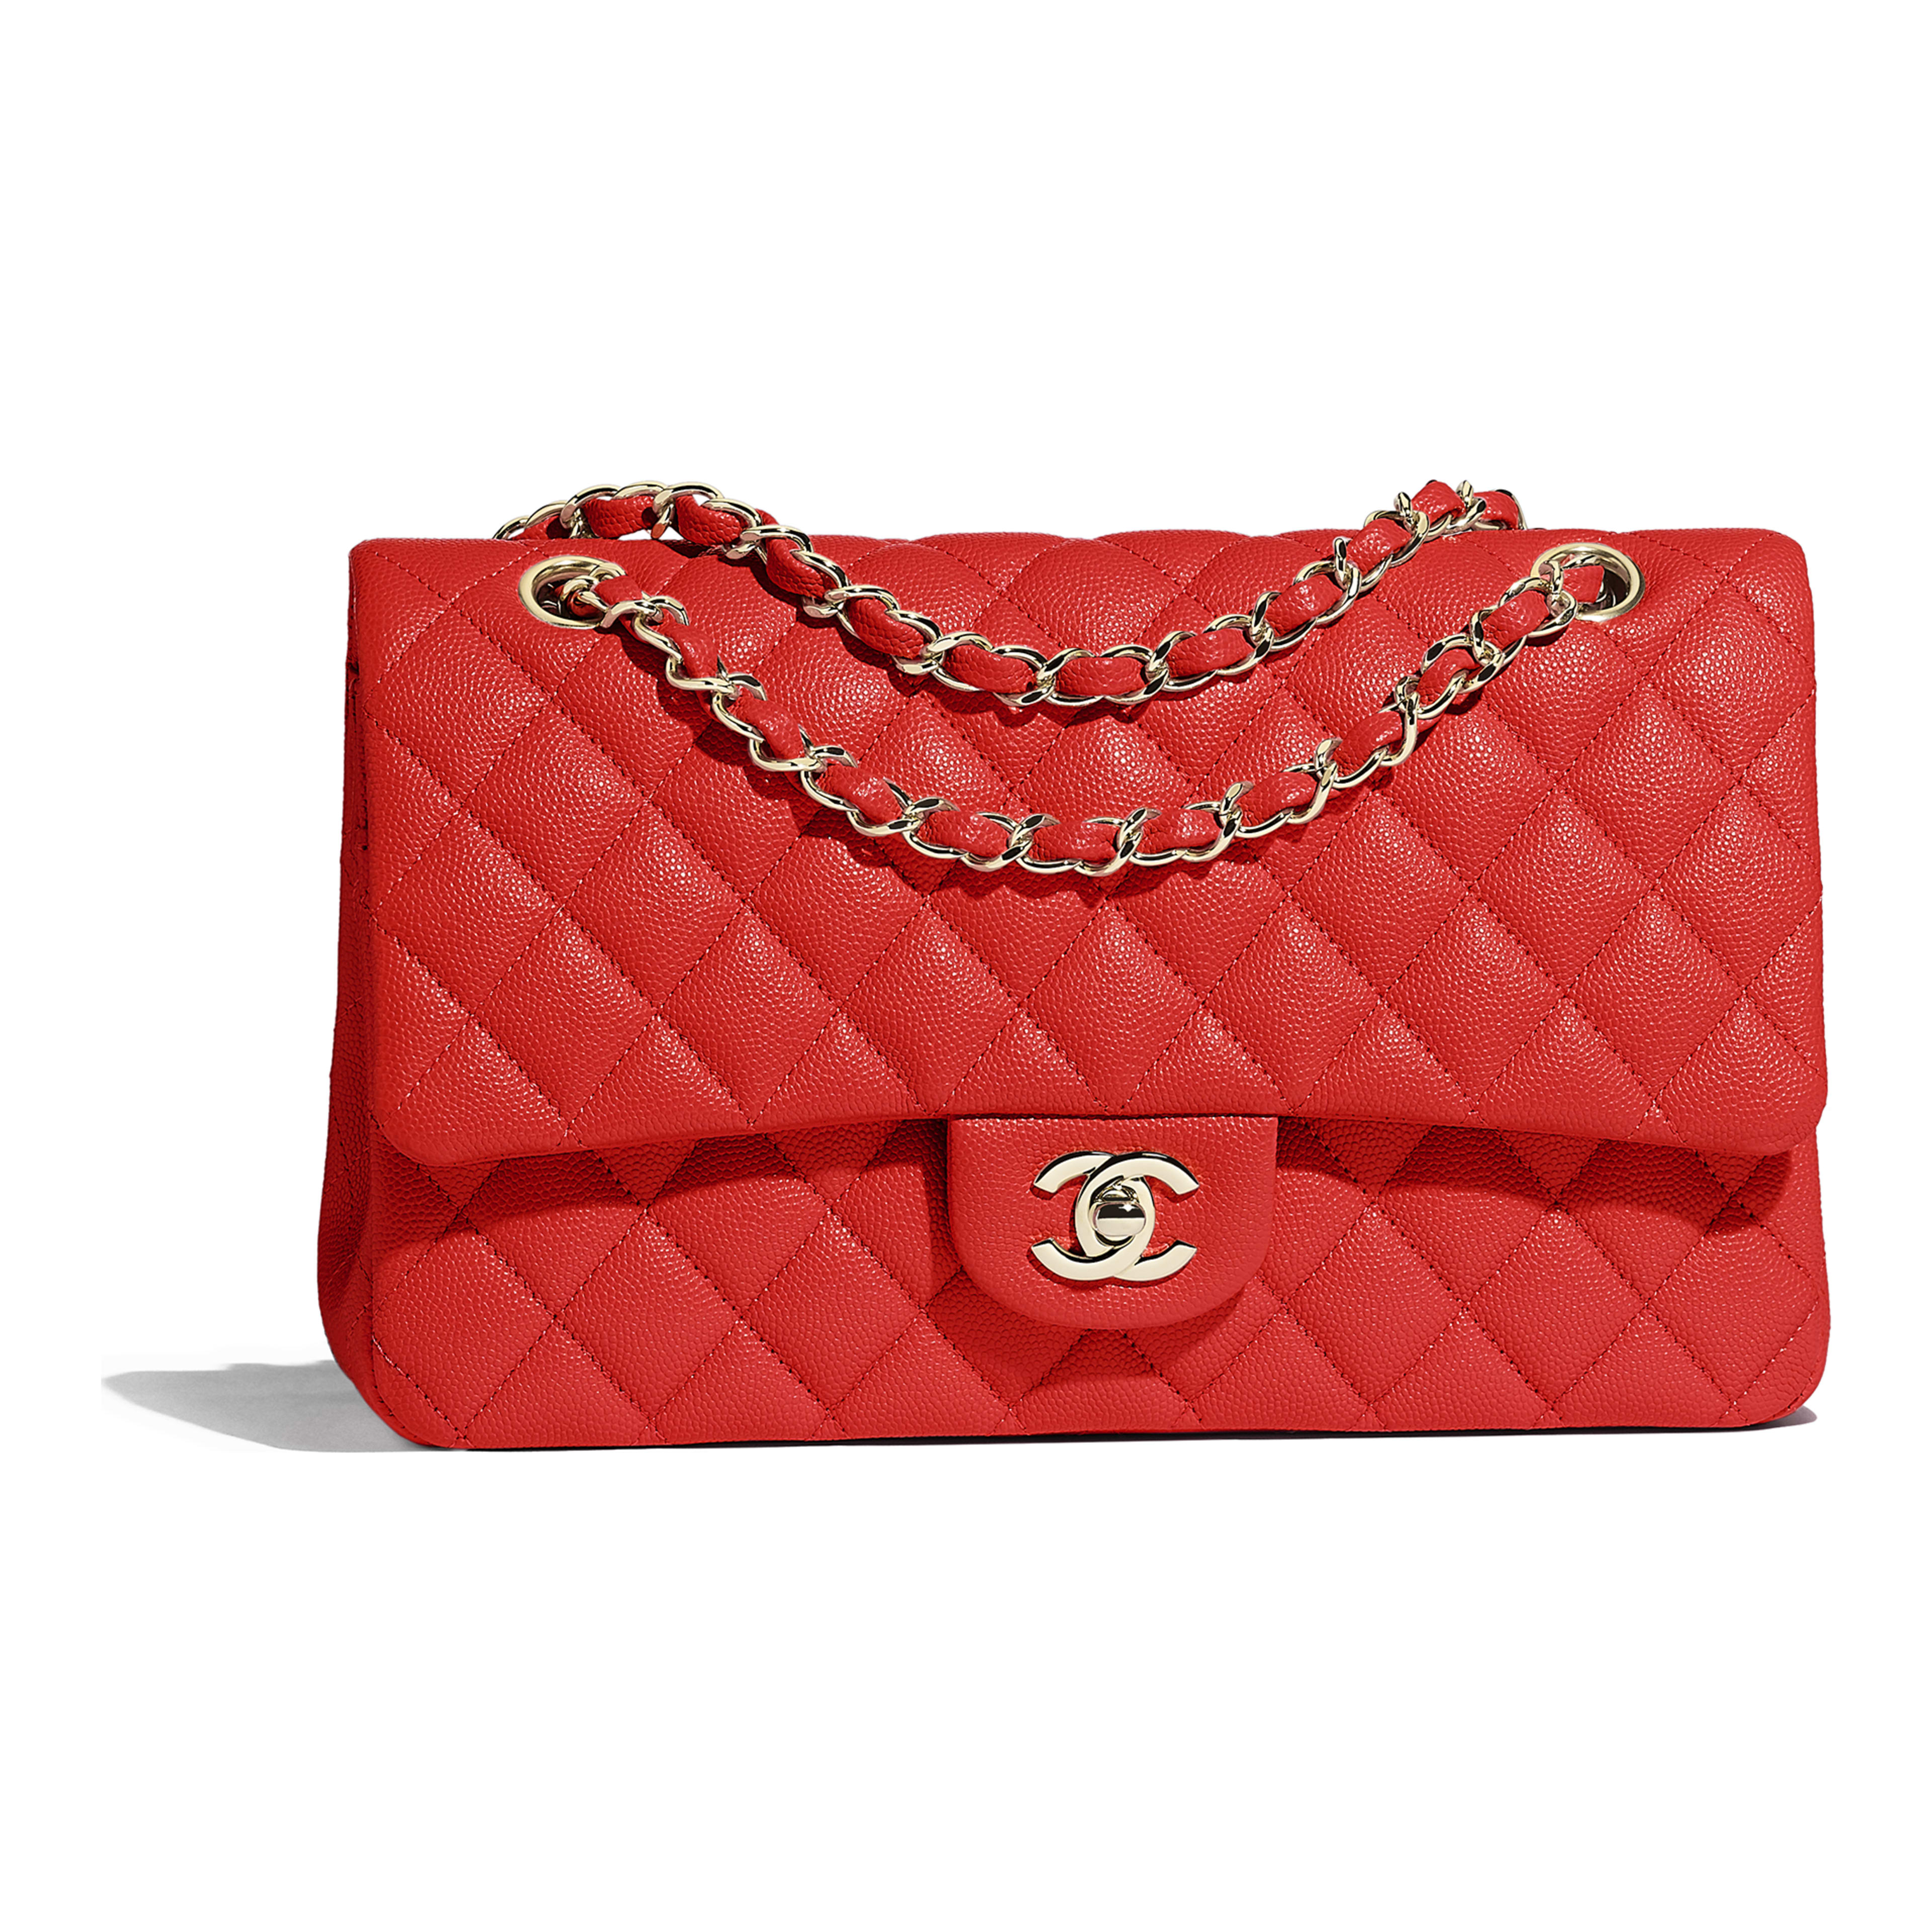 f3bd8ff43f44 Chanel Red Handbag - Foto Handbag All Collections Salonagafiya.Com